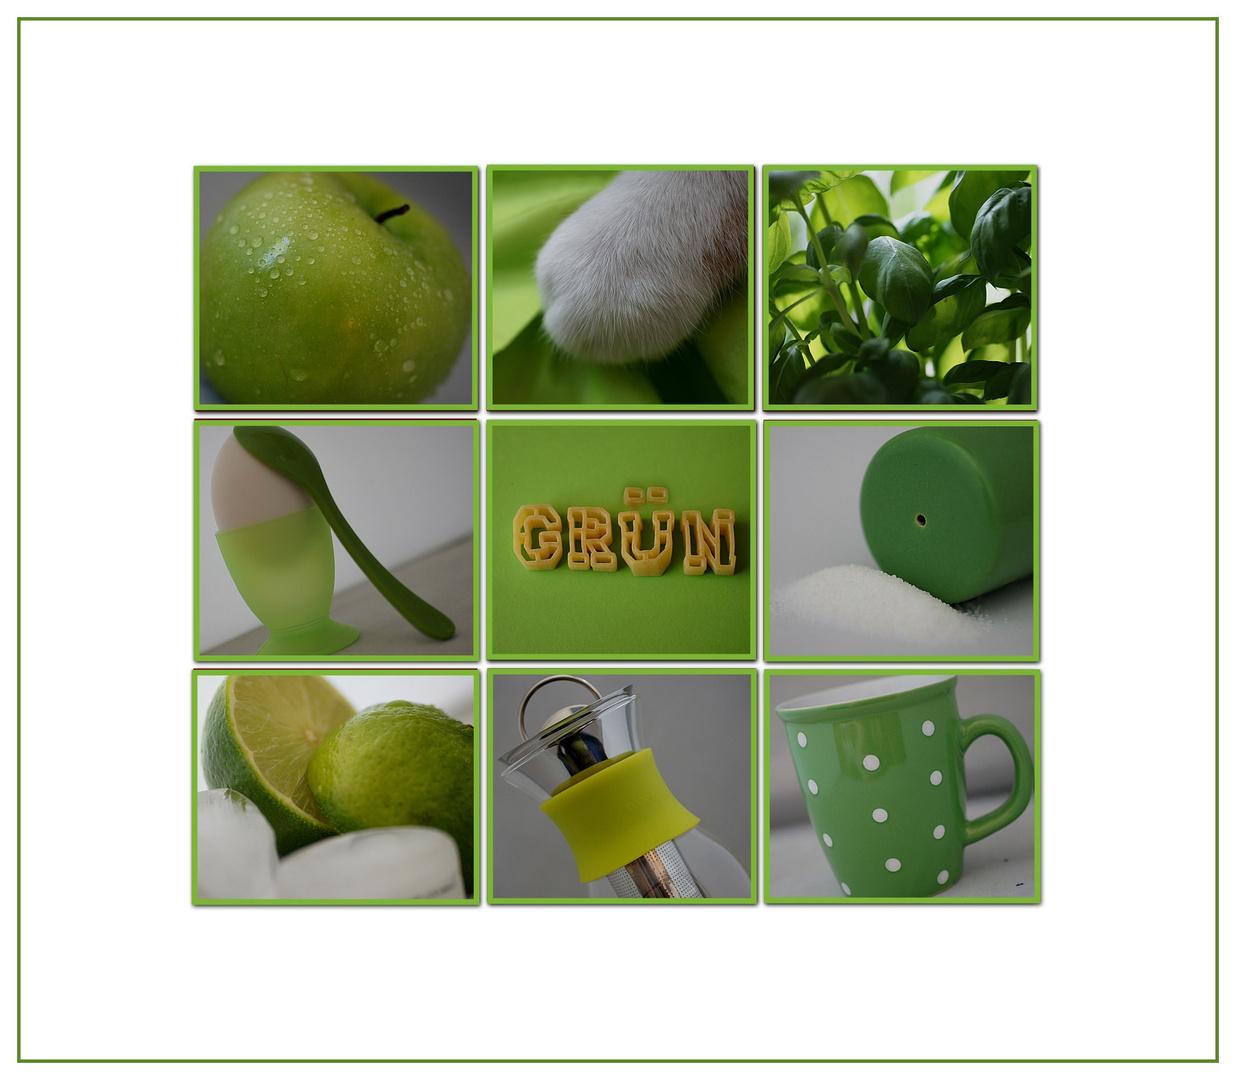 Küchengrannysmithgrün